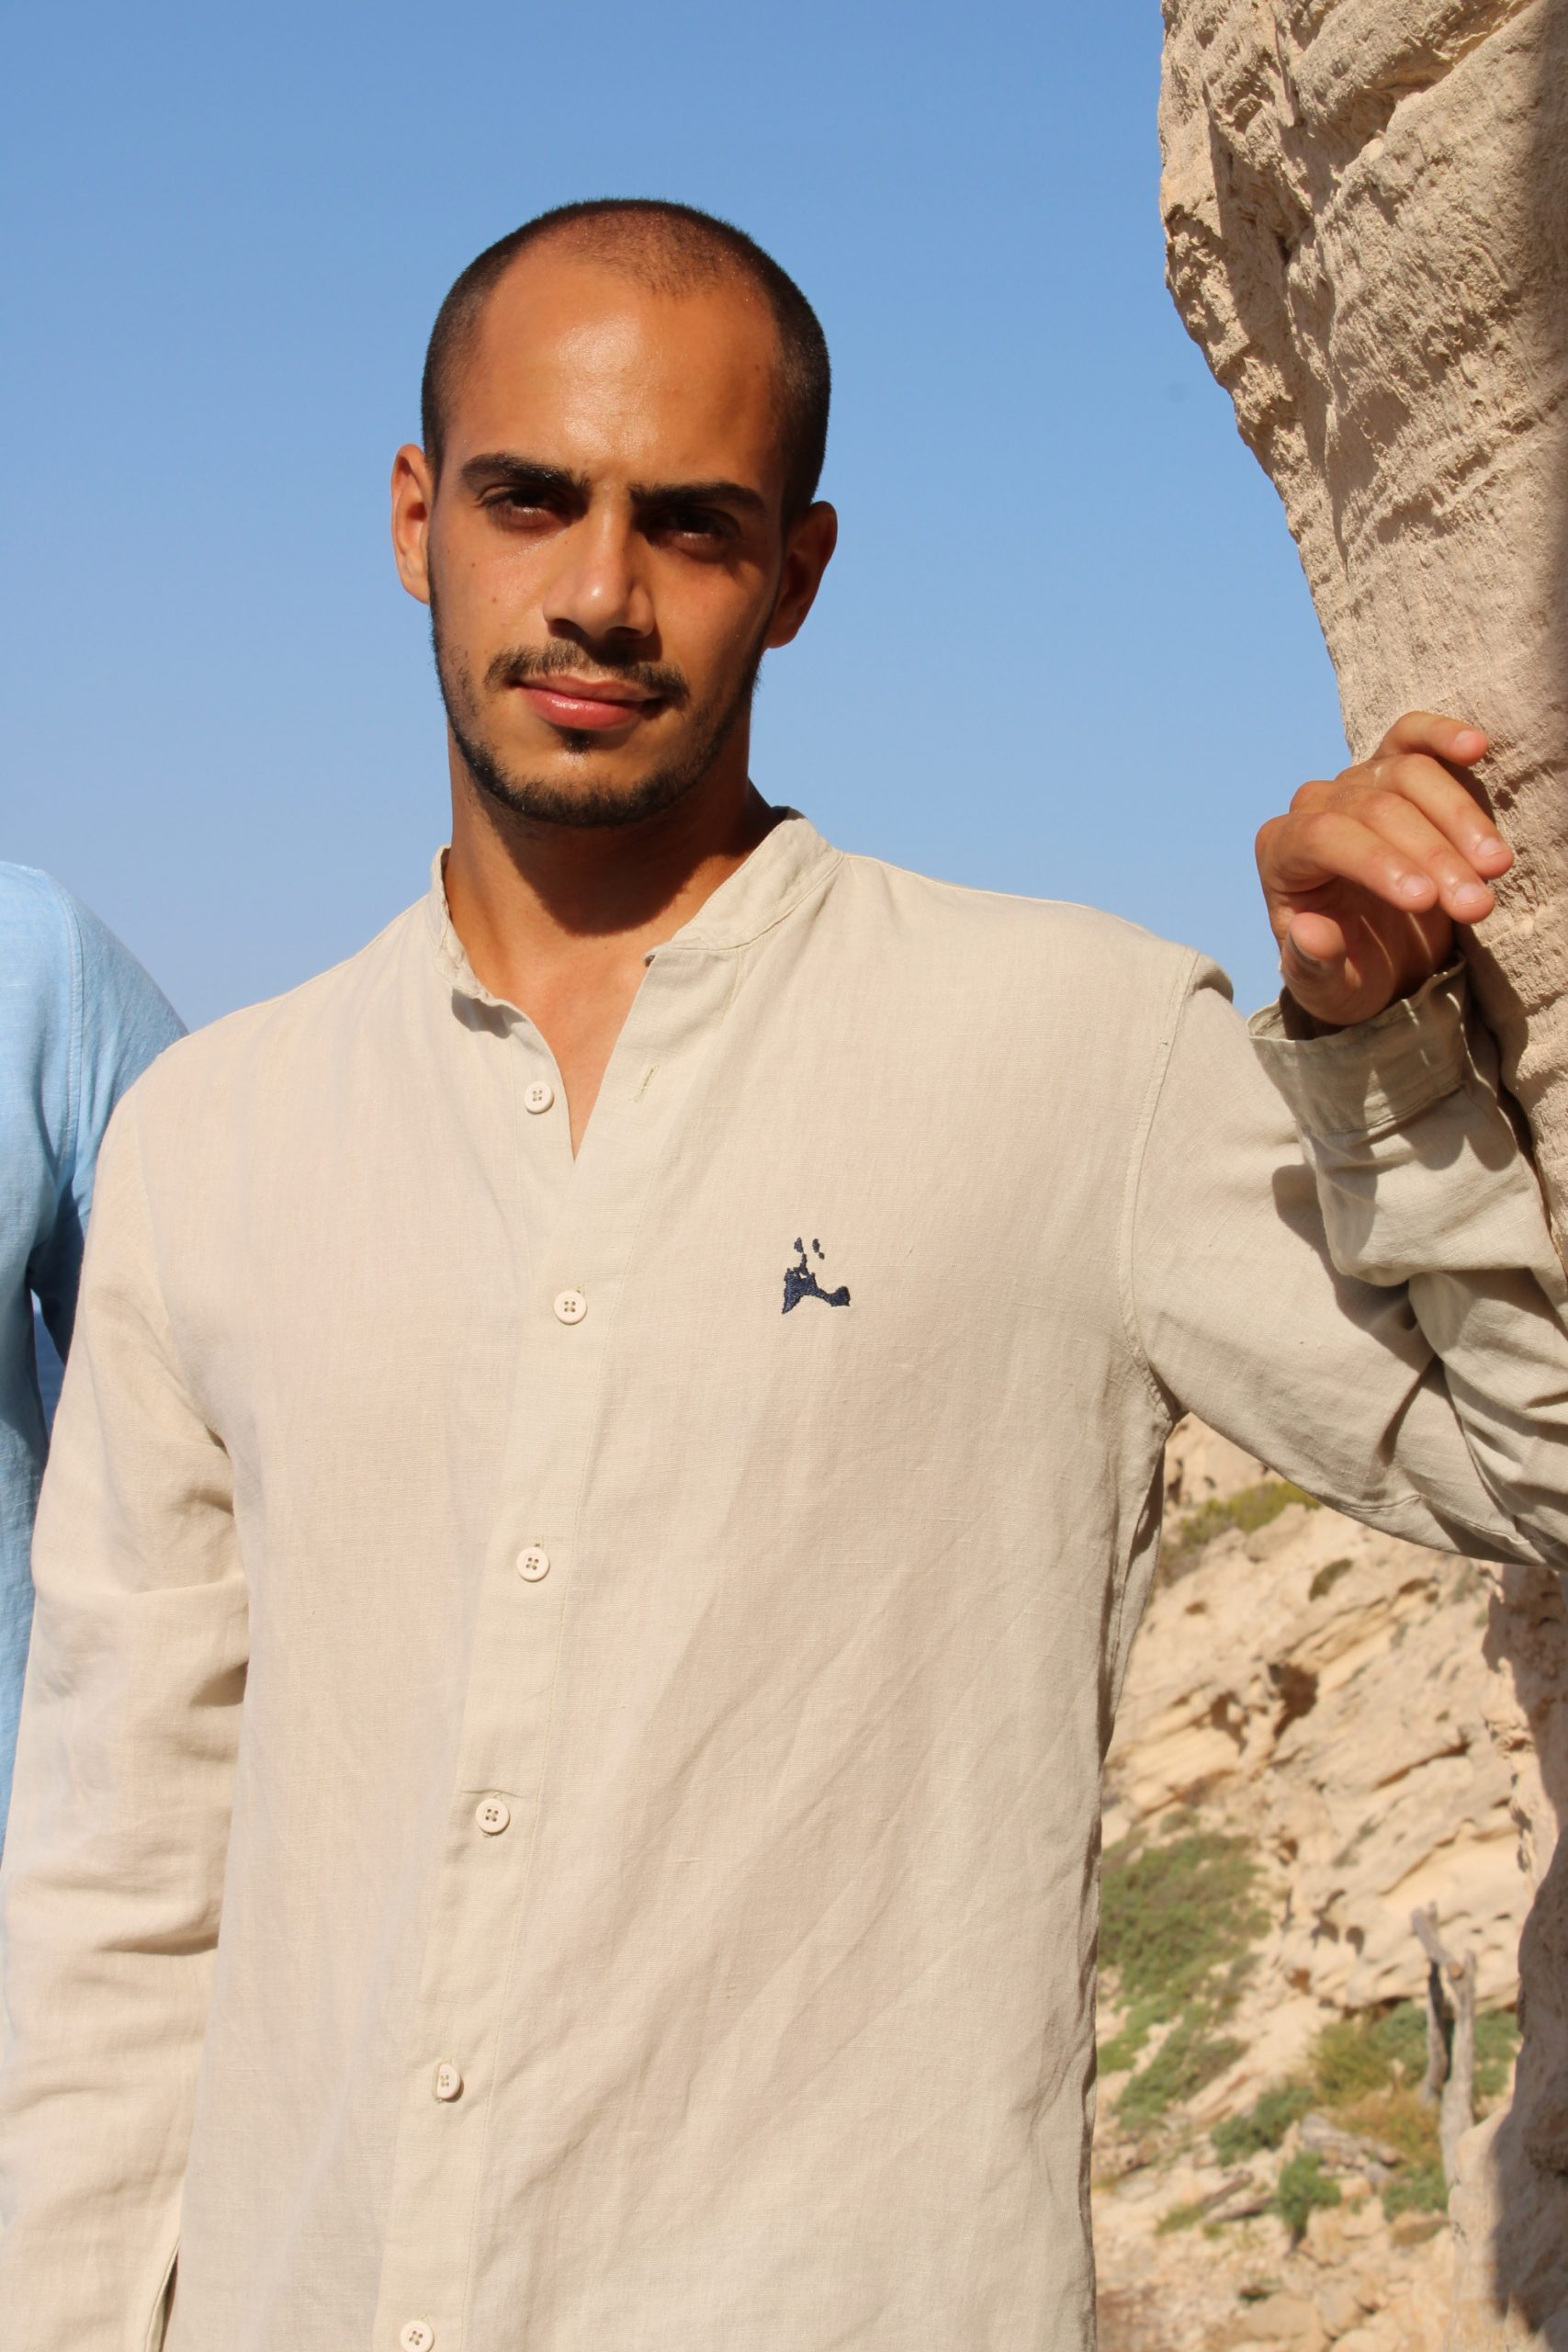 Camisa larga insula lino